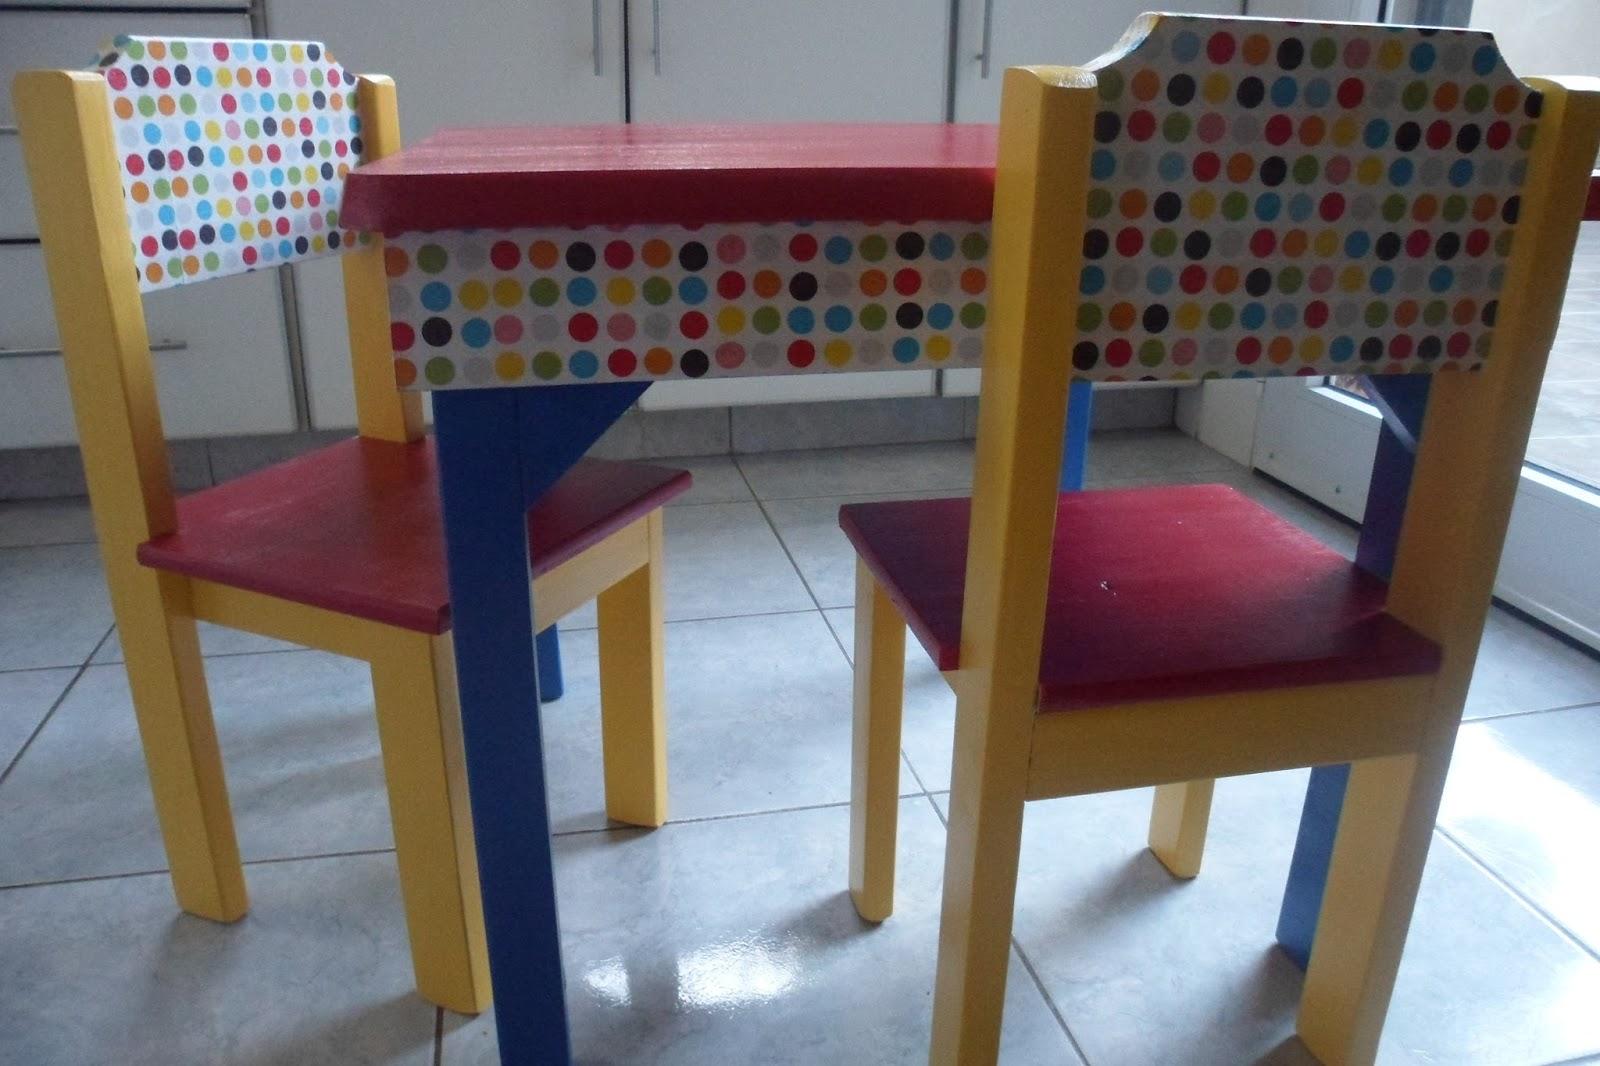 Localinda objetos de dise o mesita y sillas para ni os - Mesita con sillas infantiles ...